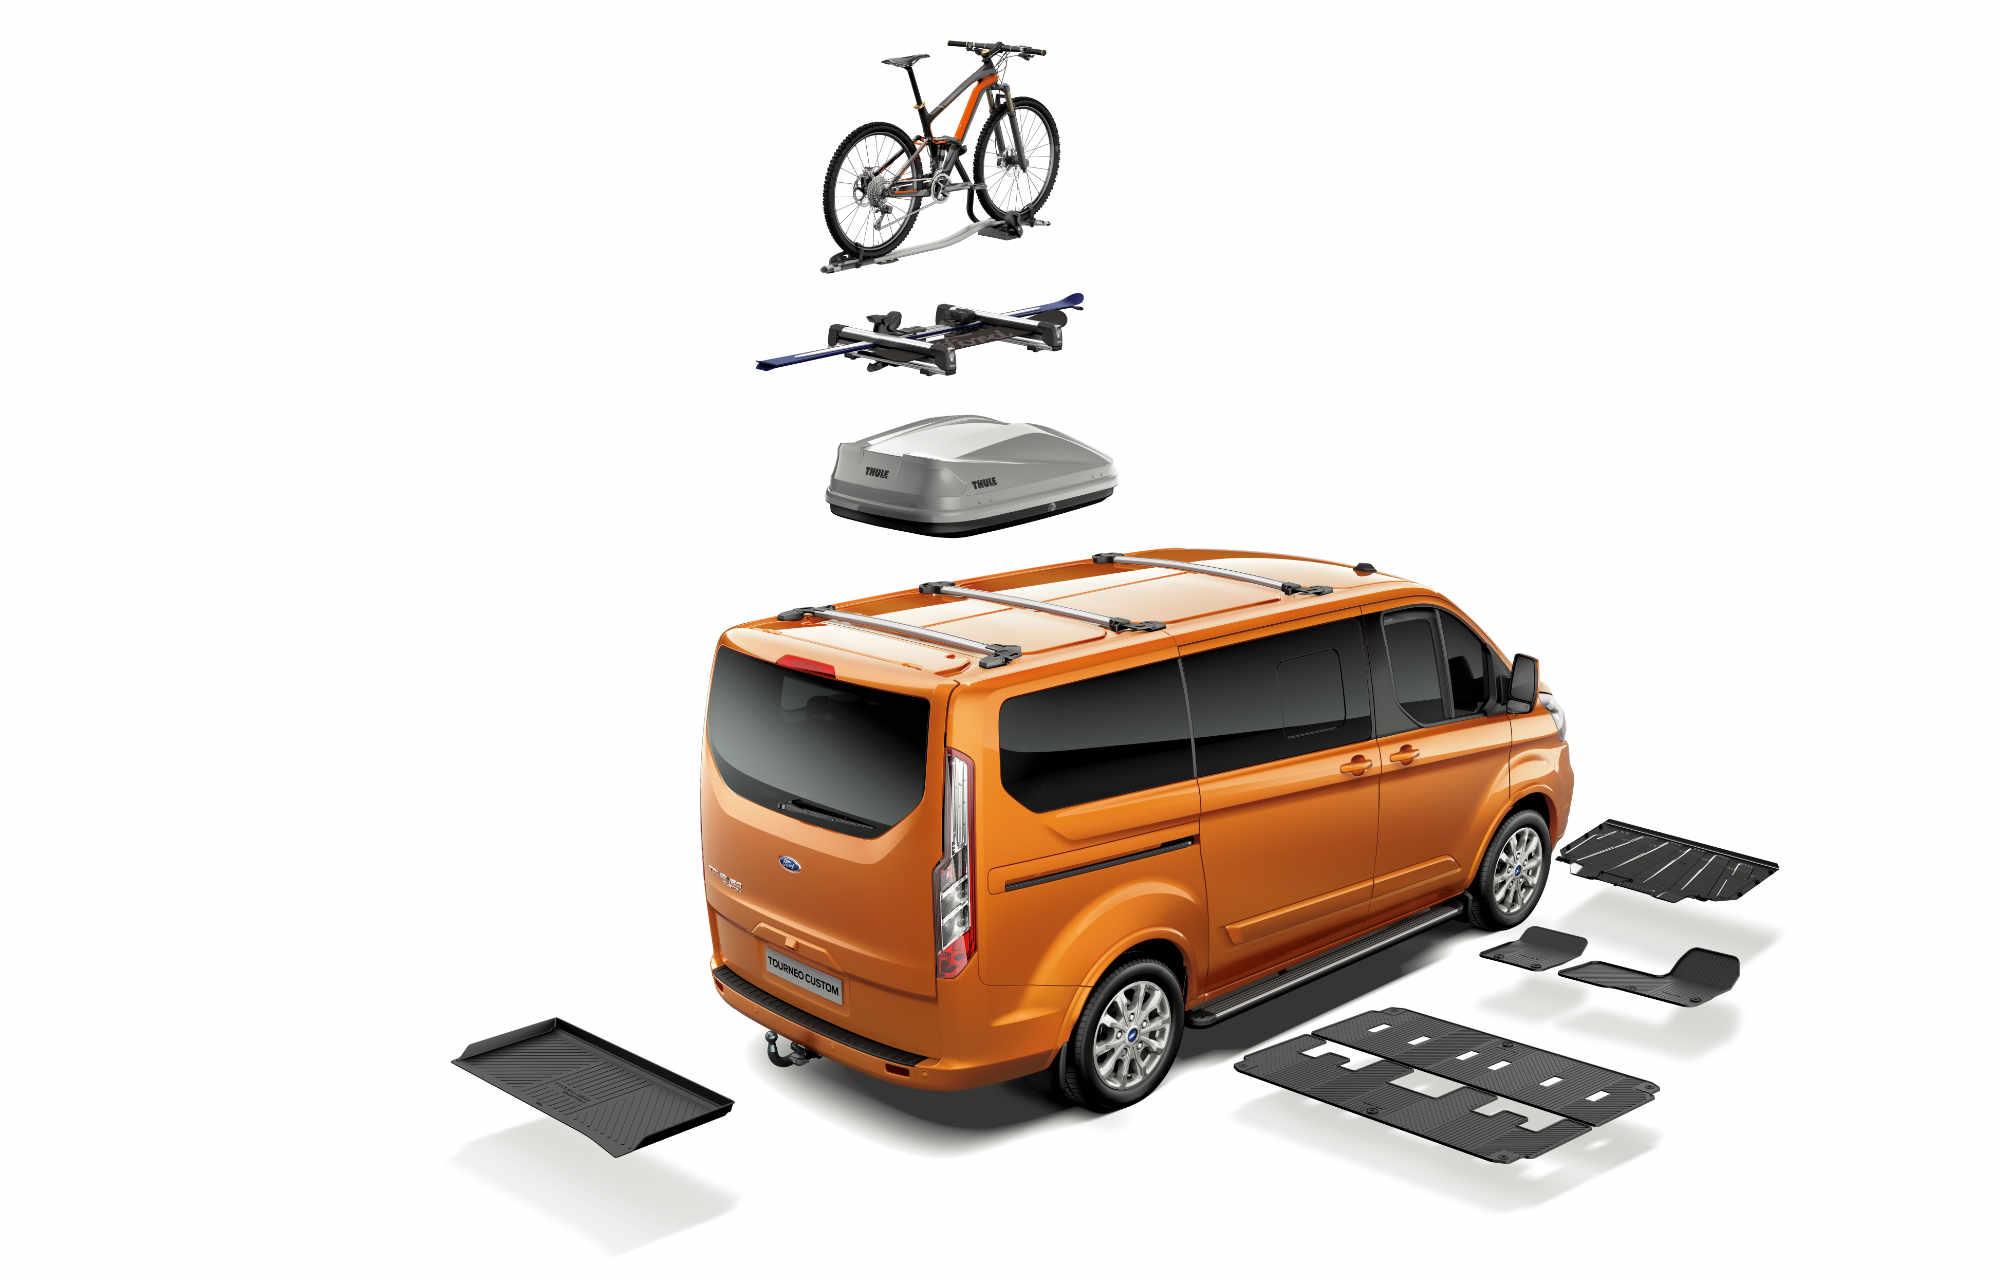 Ford Bedrijfsvoertuigen Accessoires